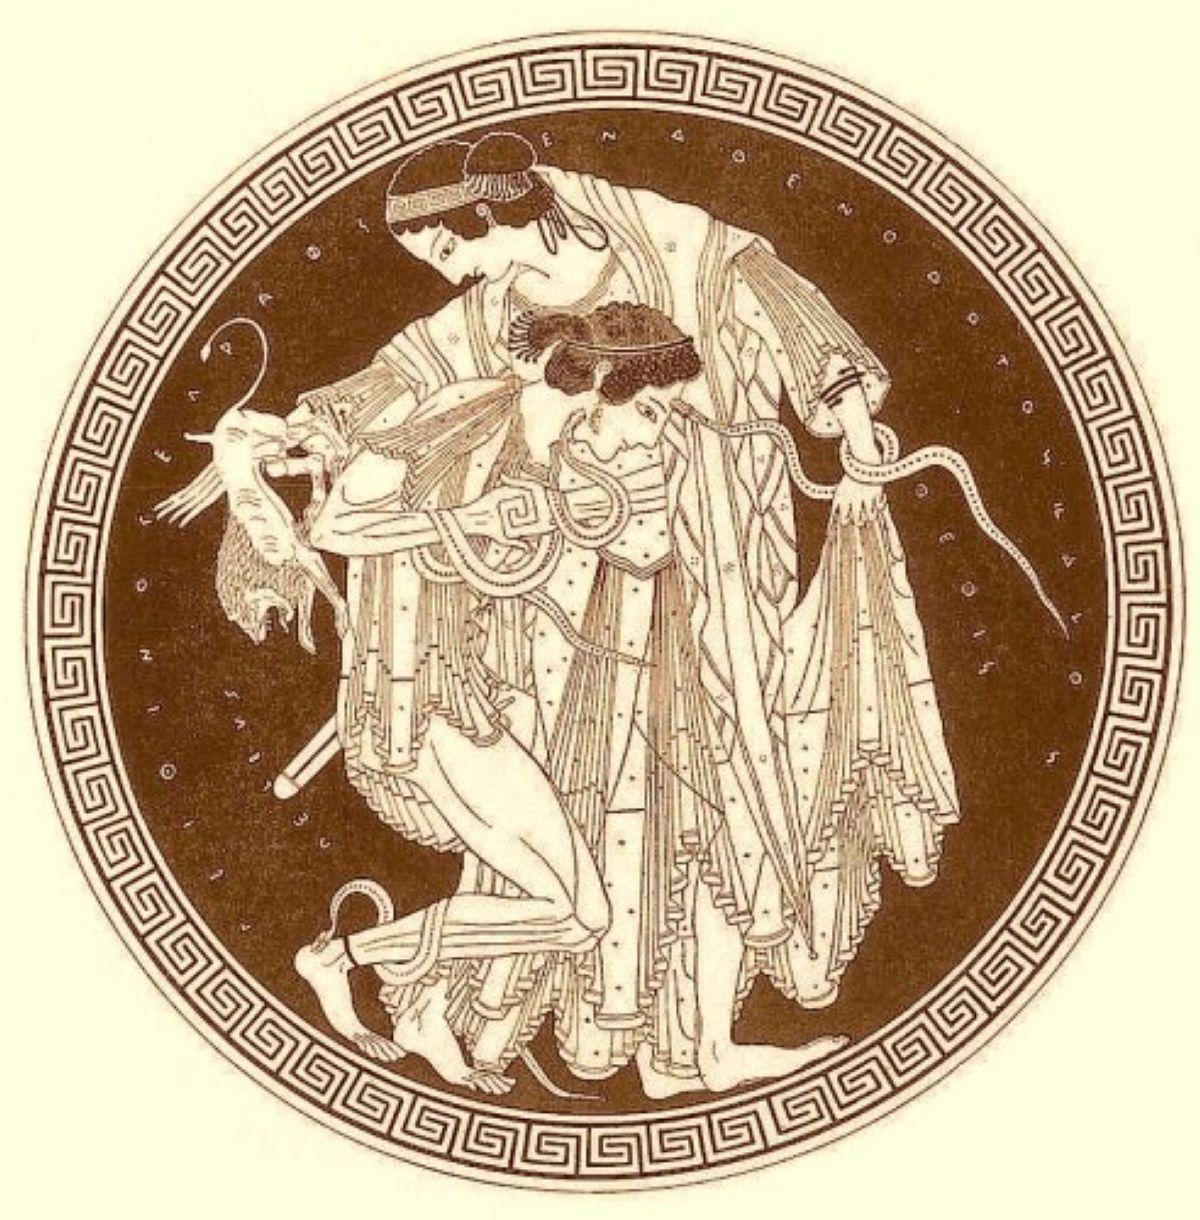 terrapapers.com thetis (1)